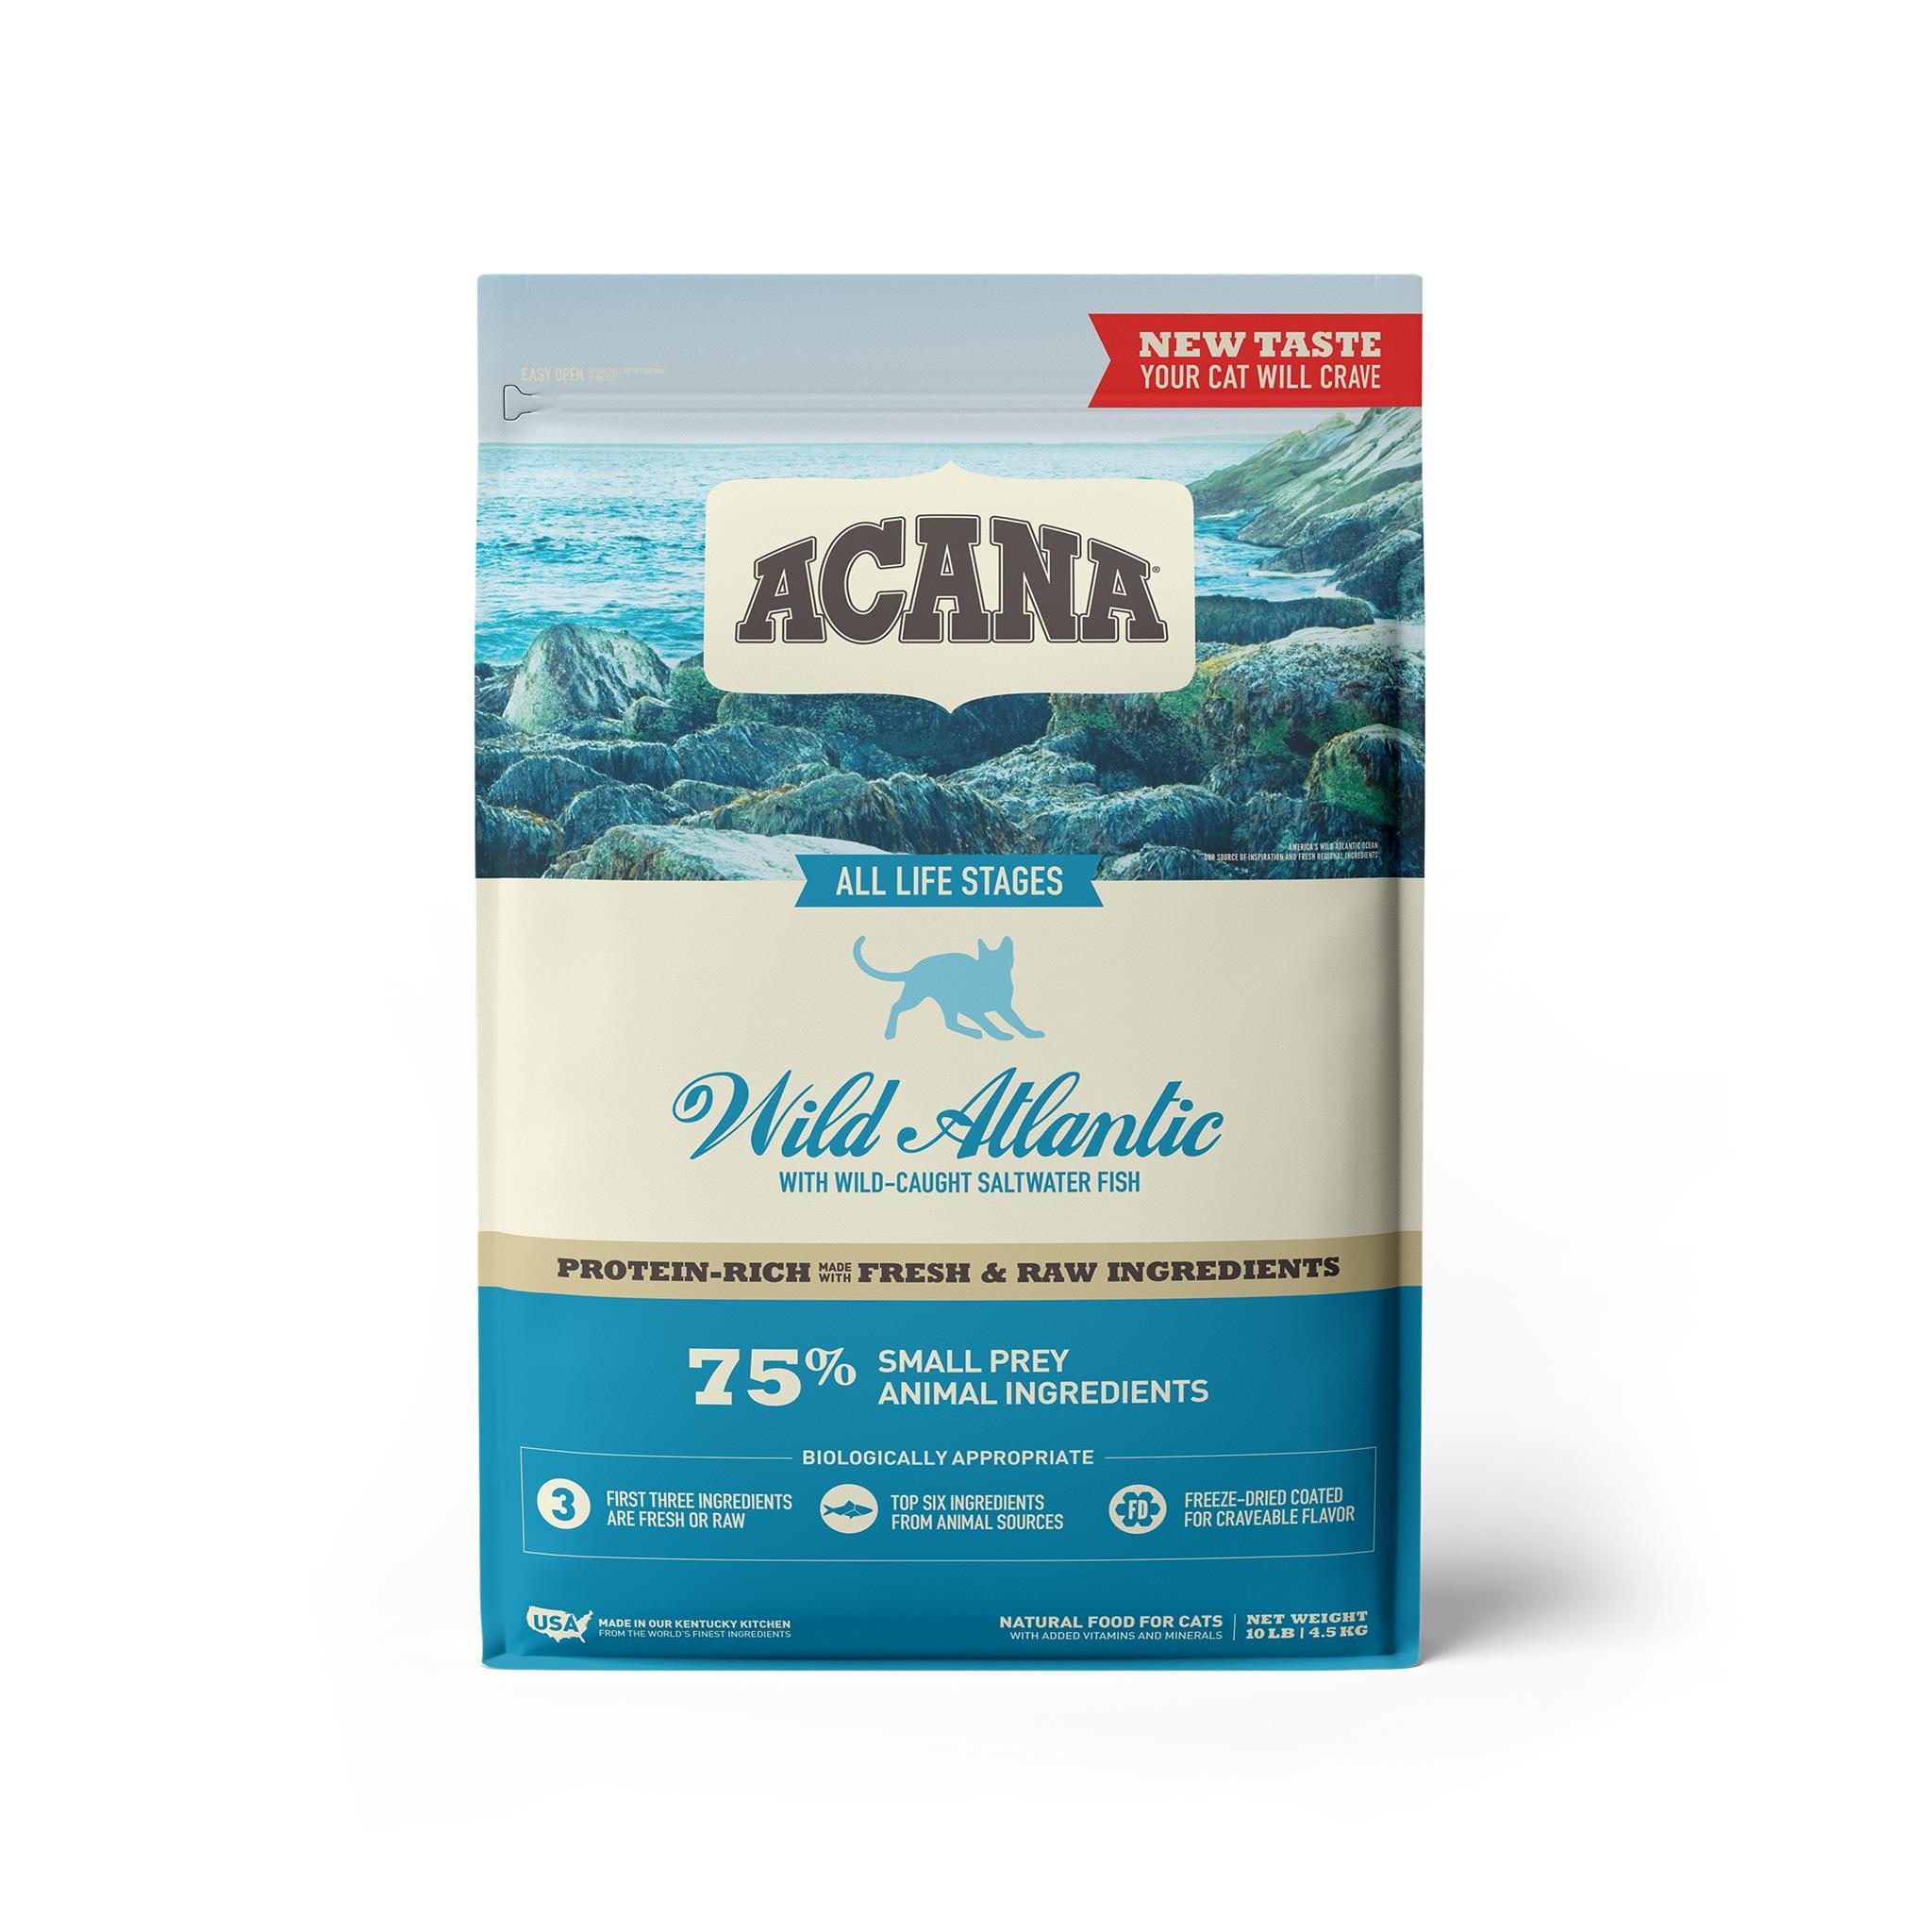 ACANA Wild Atlantic Grain-Free Dry Cat Food, 10-lb bag